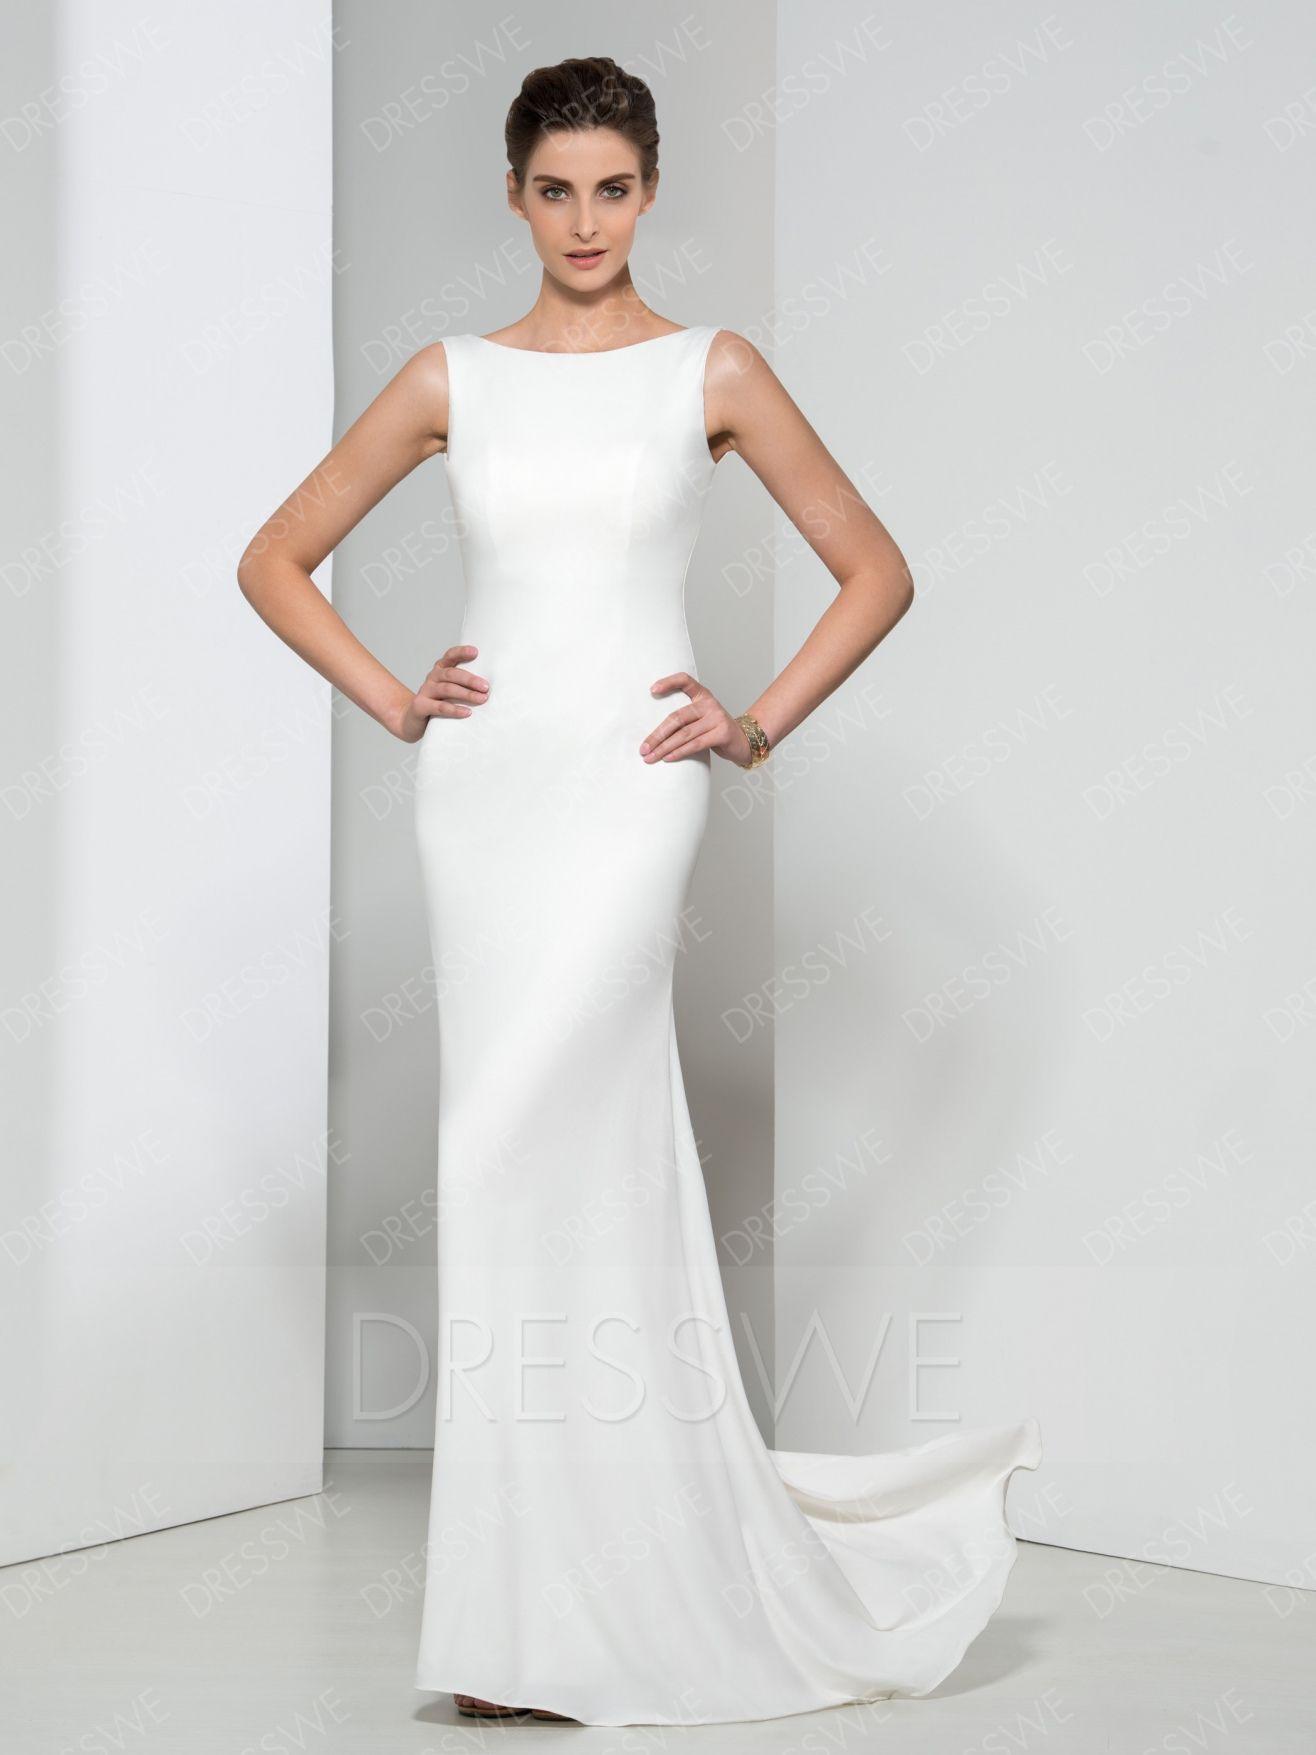 99+ evening Wedding Dresses - Country Dresses for Weddings Check ...